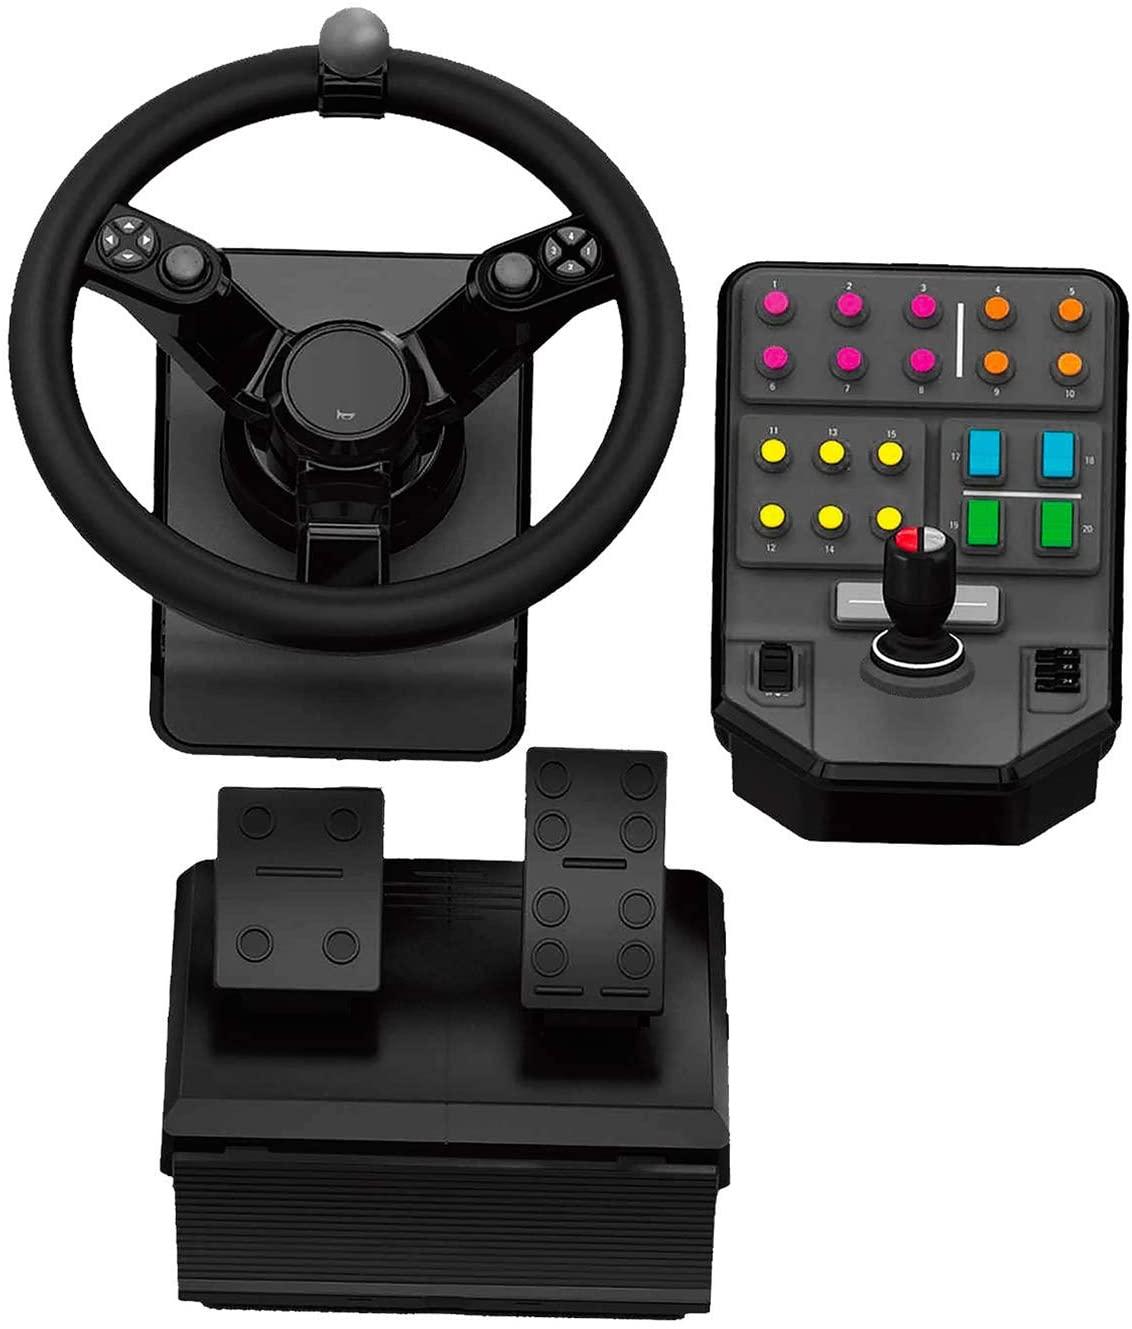 Logitech G Saitek Farm Sim Controller, Farming Simulator Bundle bestehend aus Lenkrad, Steuerkonsole, Gas- und Bremspedal